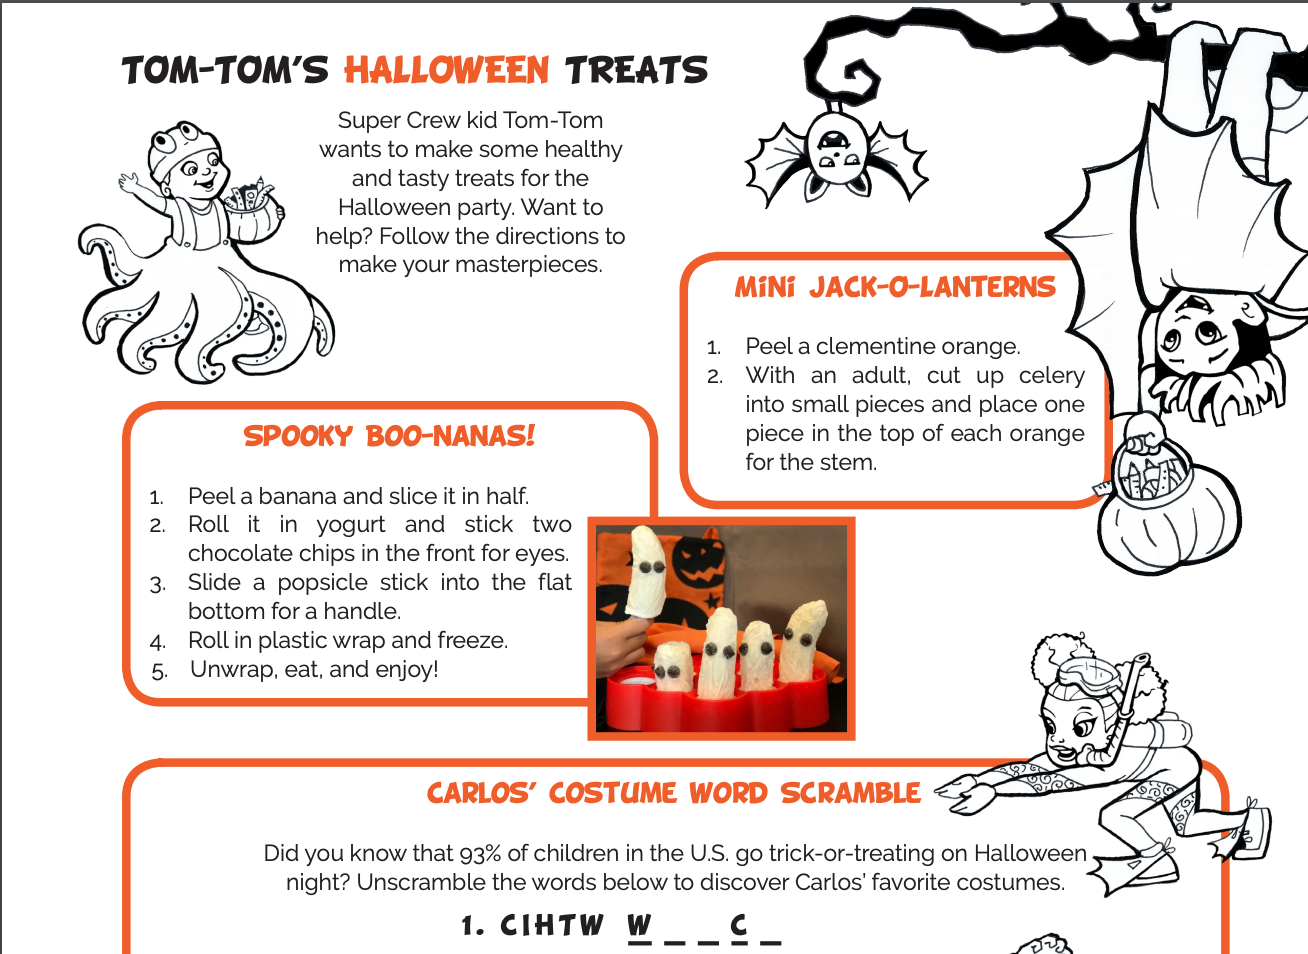 Tom-Tom's Halloween Treats